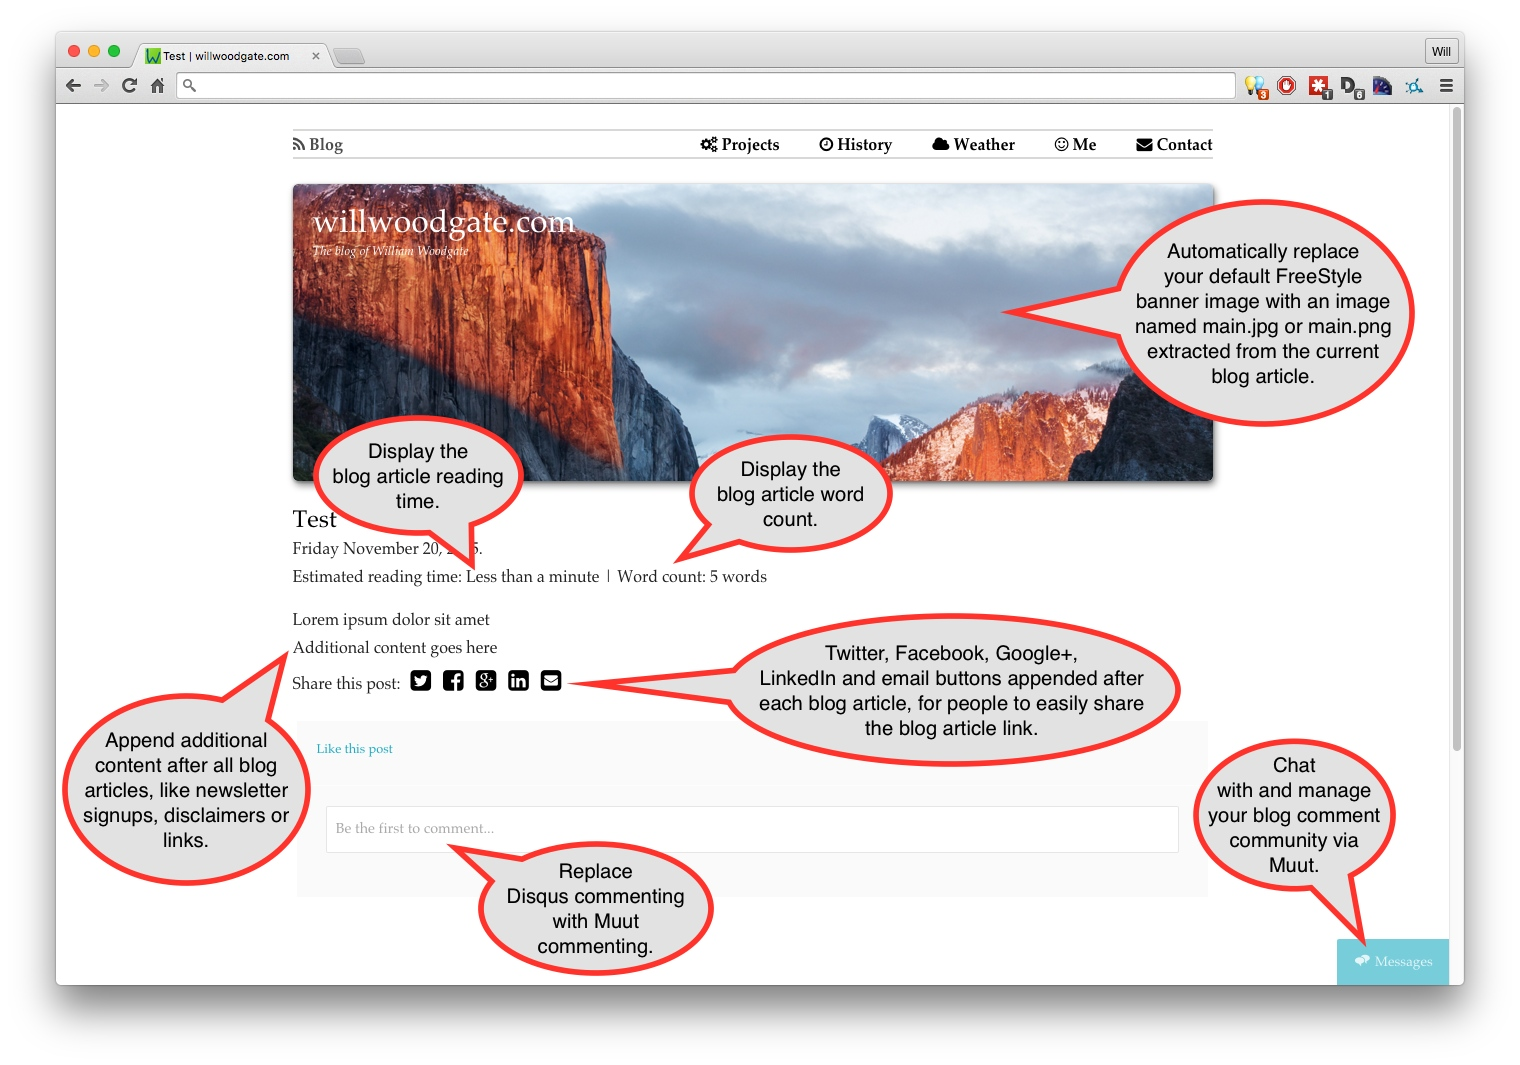 RapidWeaver Blog Enhancement Kit